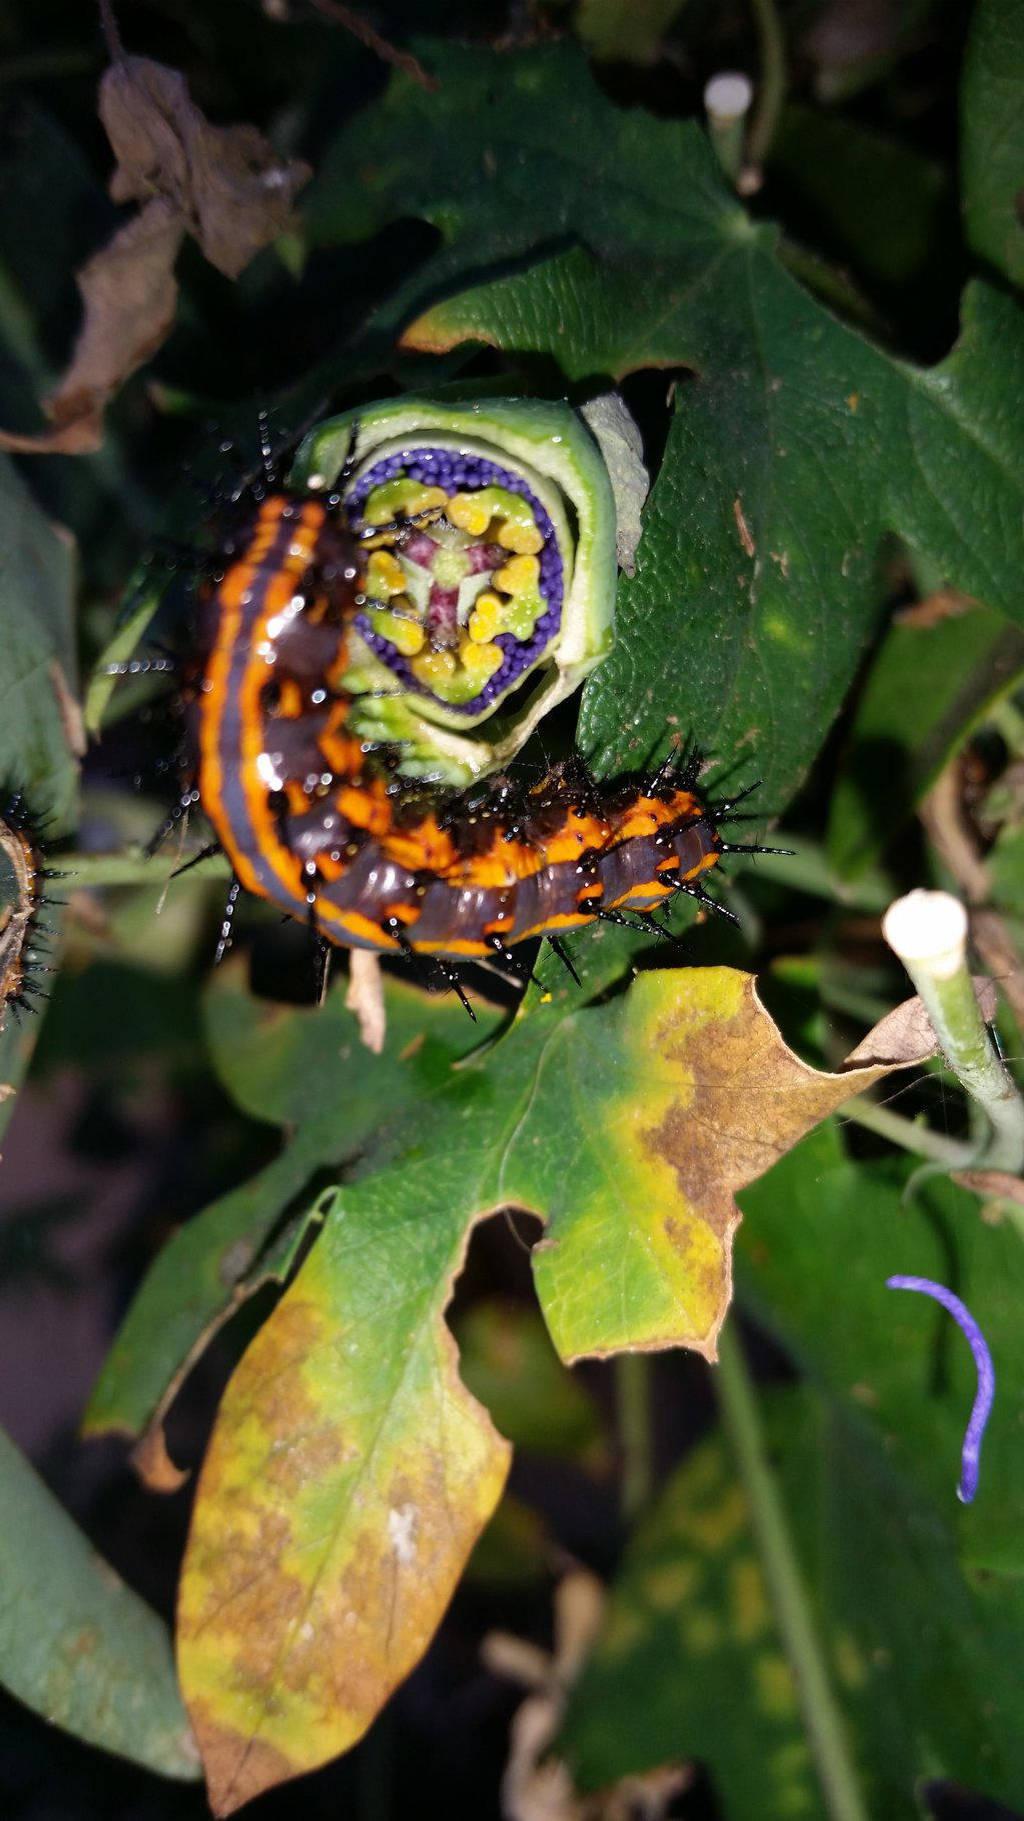 caterpillar botanical disection 1 by calvincanibus